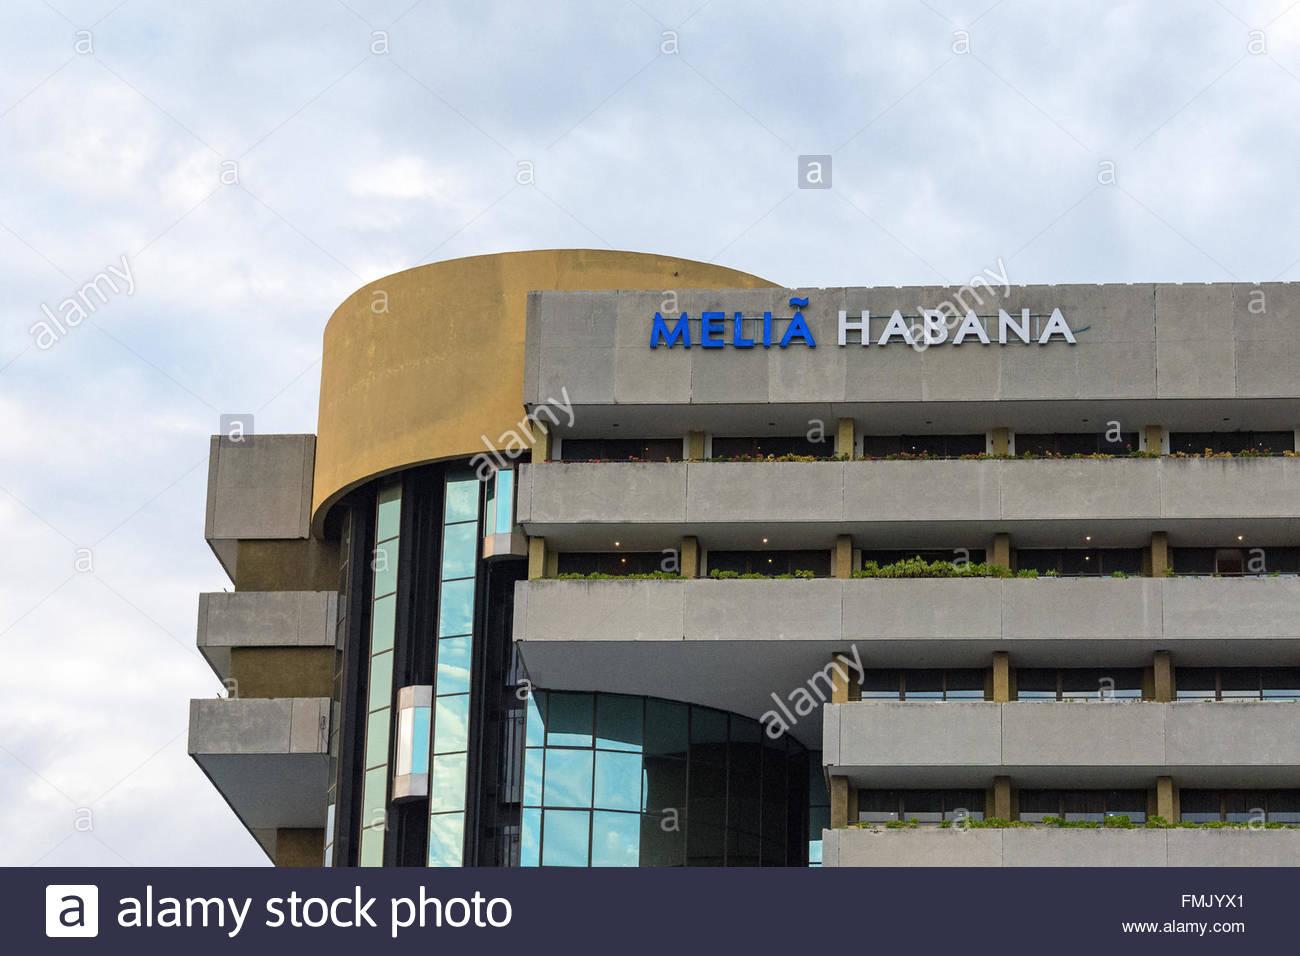 Melia Habana exterior facade architectural detail. Located in Havana's quiet and quaint Miramar district the Melia - Stock Image